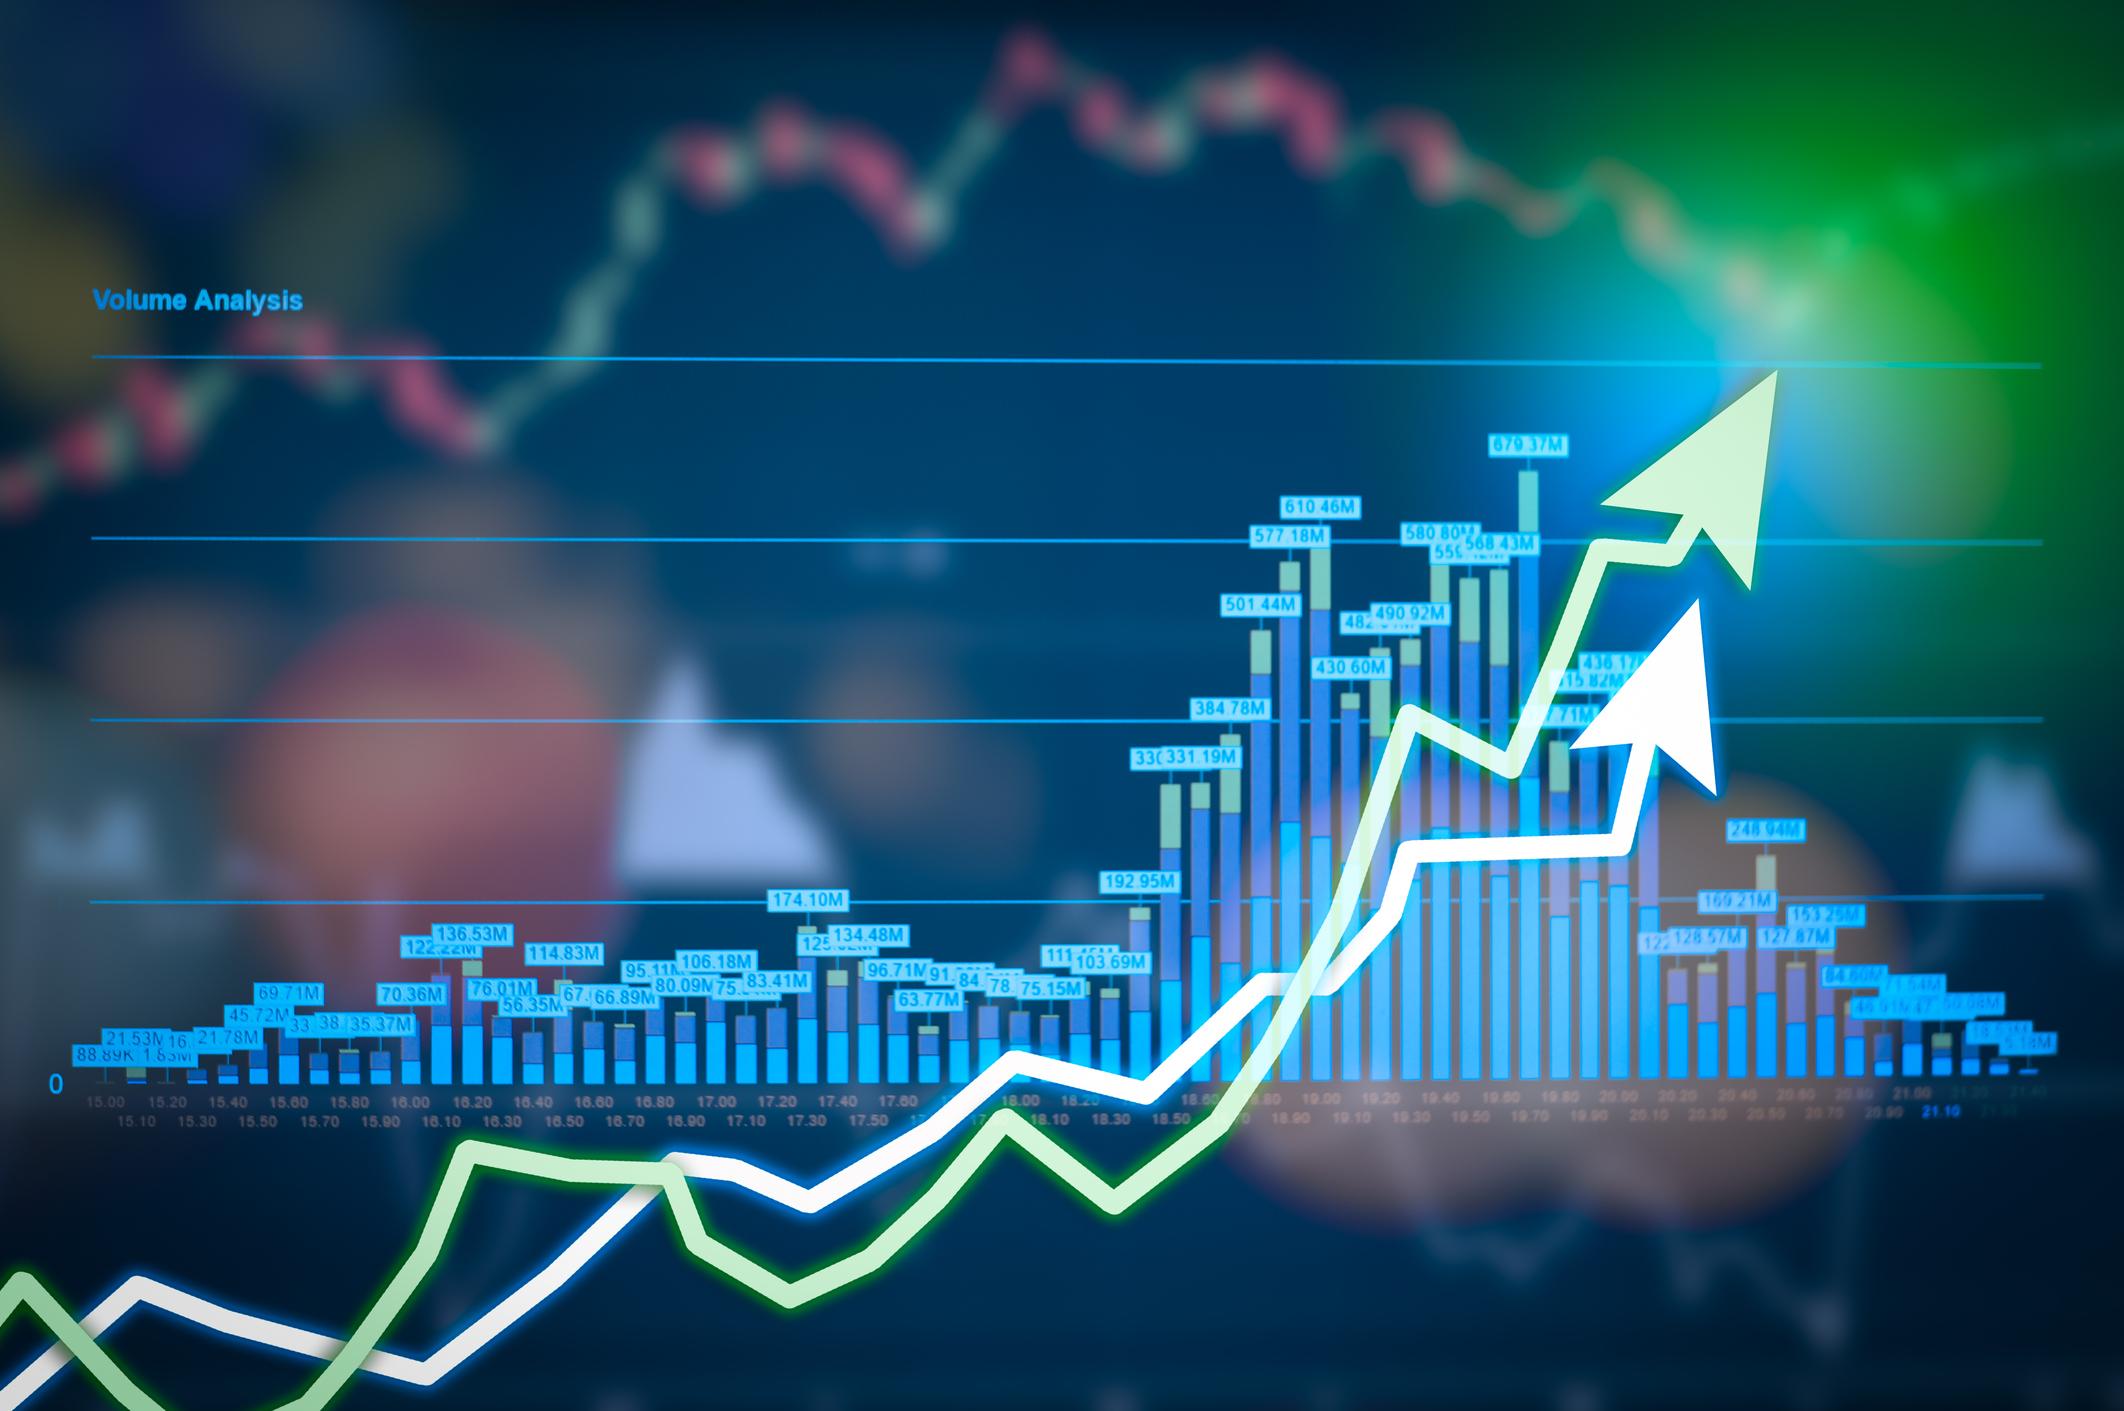 Blue-and-green stock market charts indicating gains